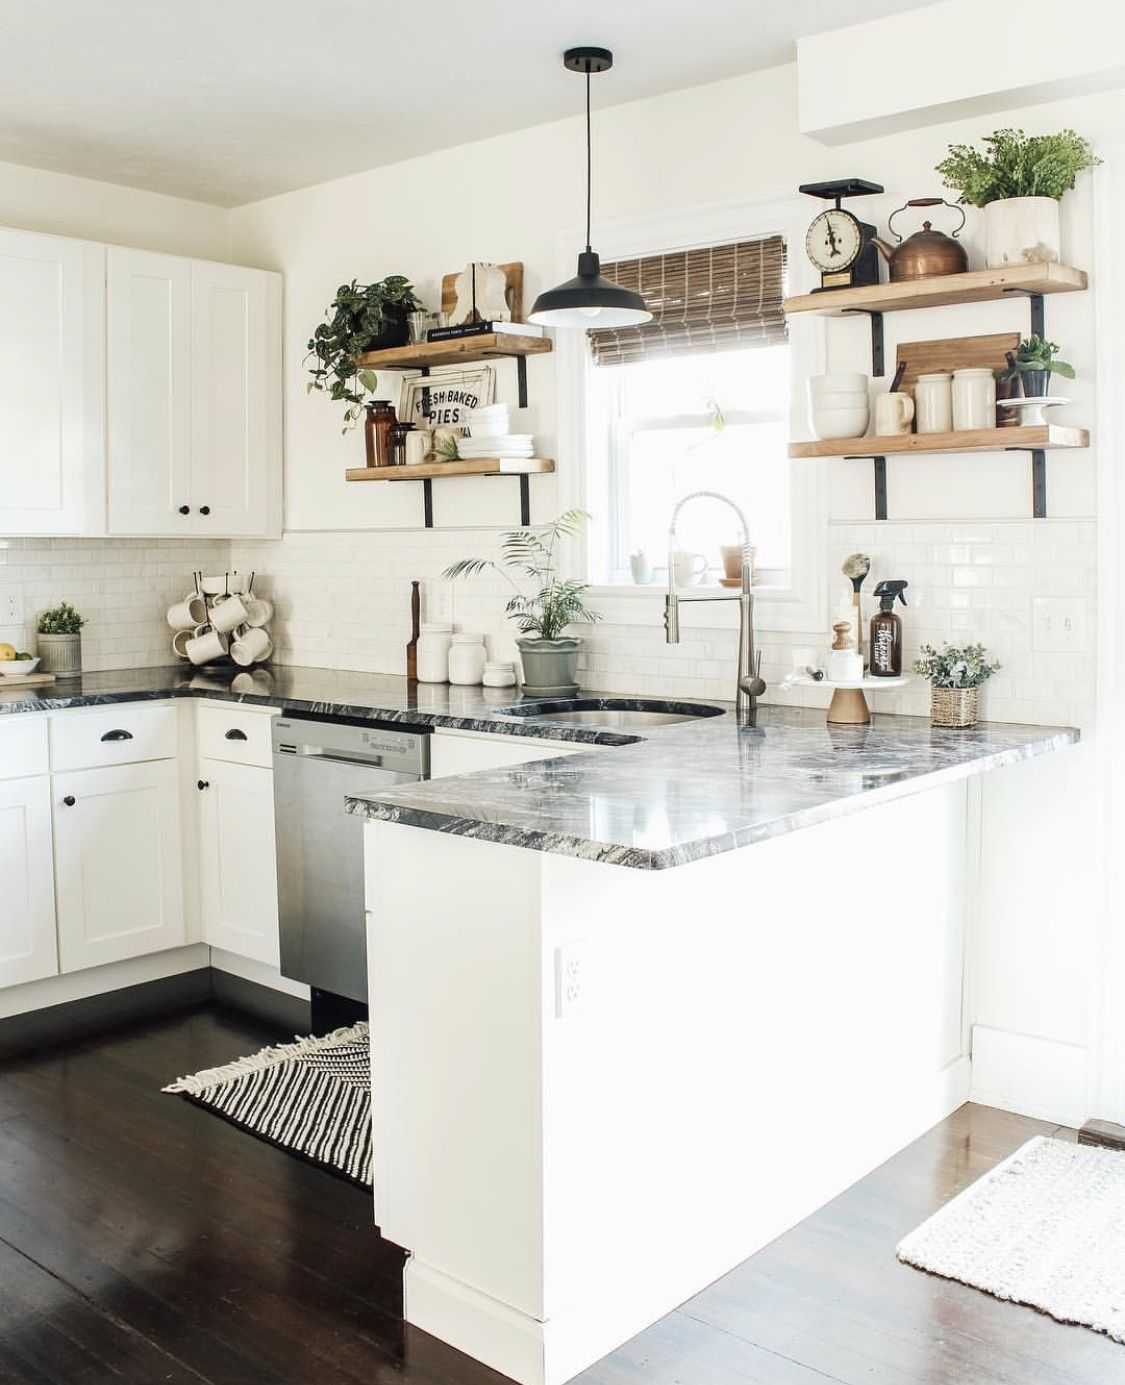 Download Wallpaper Black And White Farmhouse Kitchen Rug